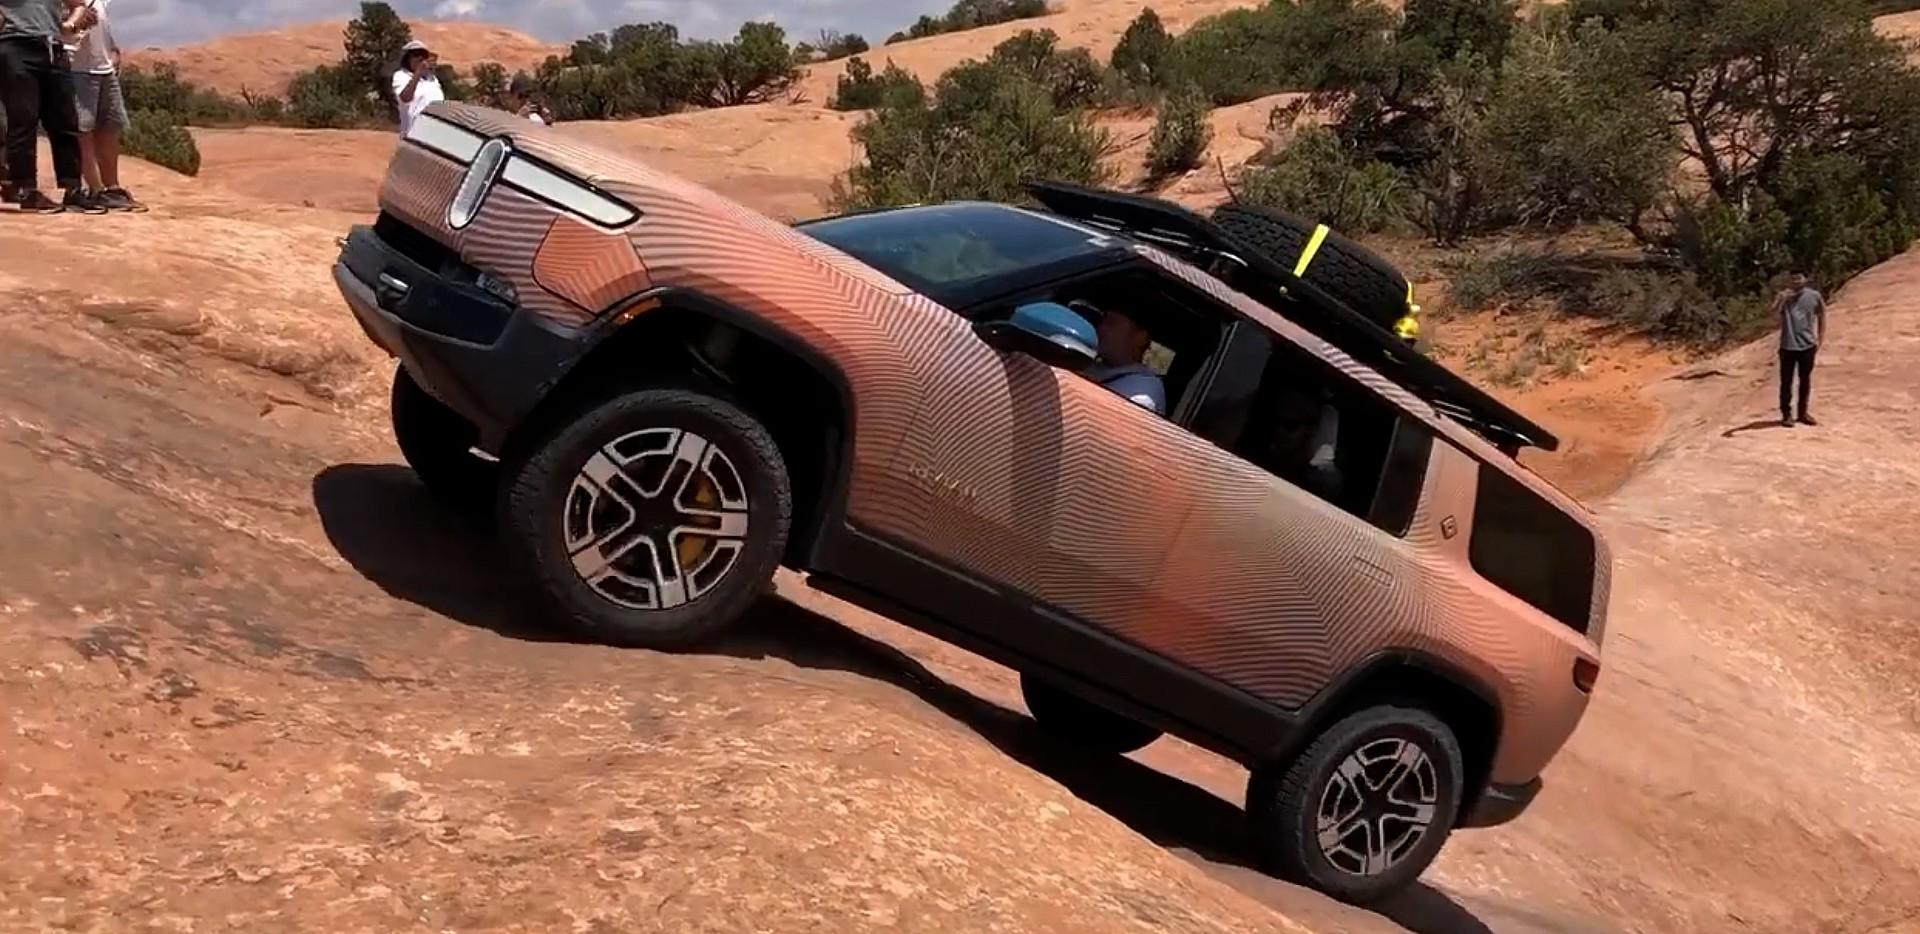 rivian-r1s-moab-scale-climb-video